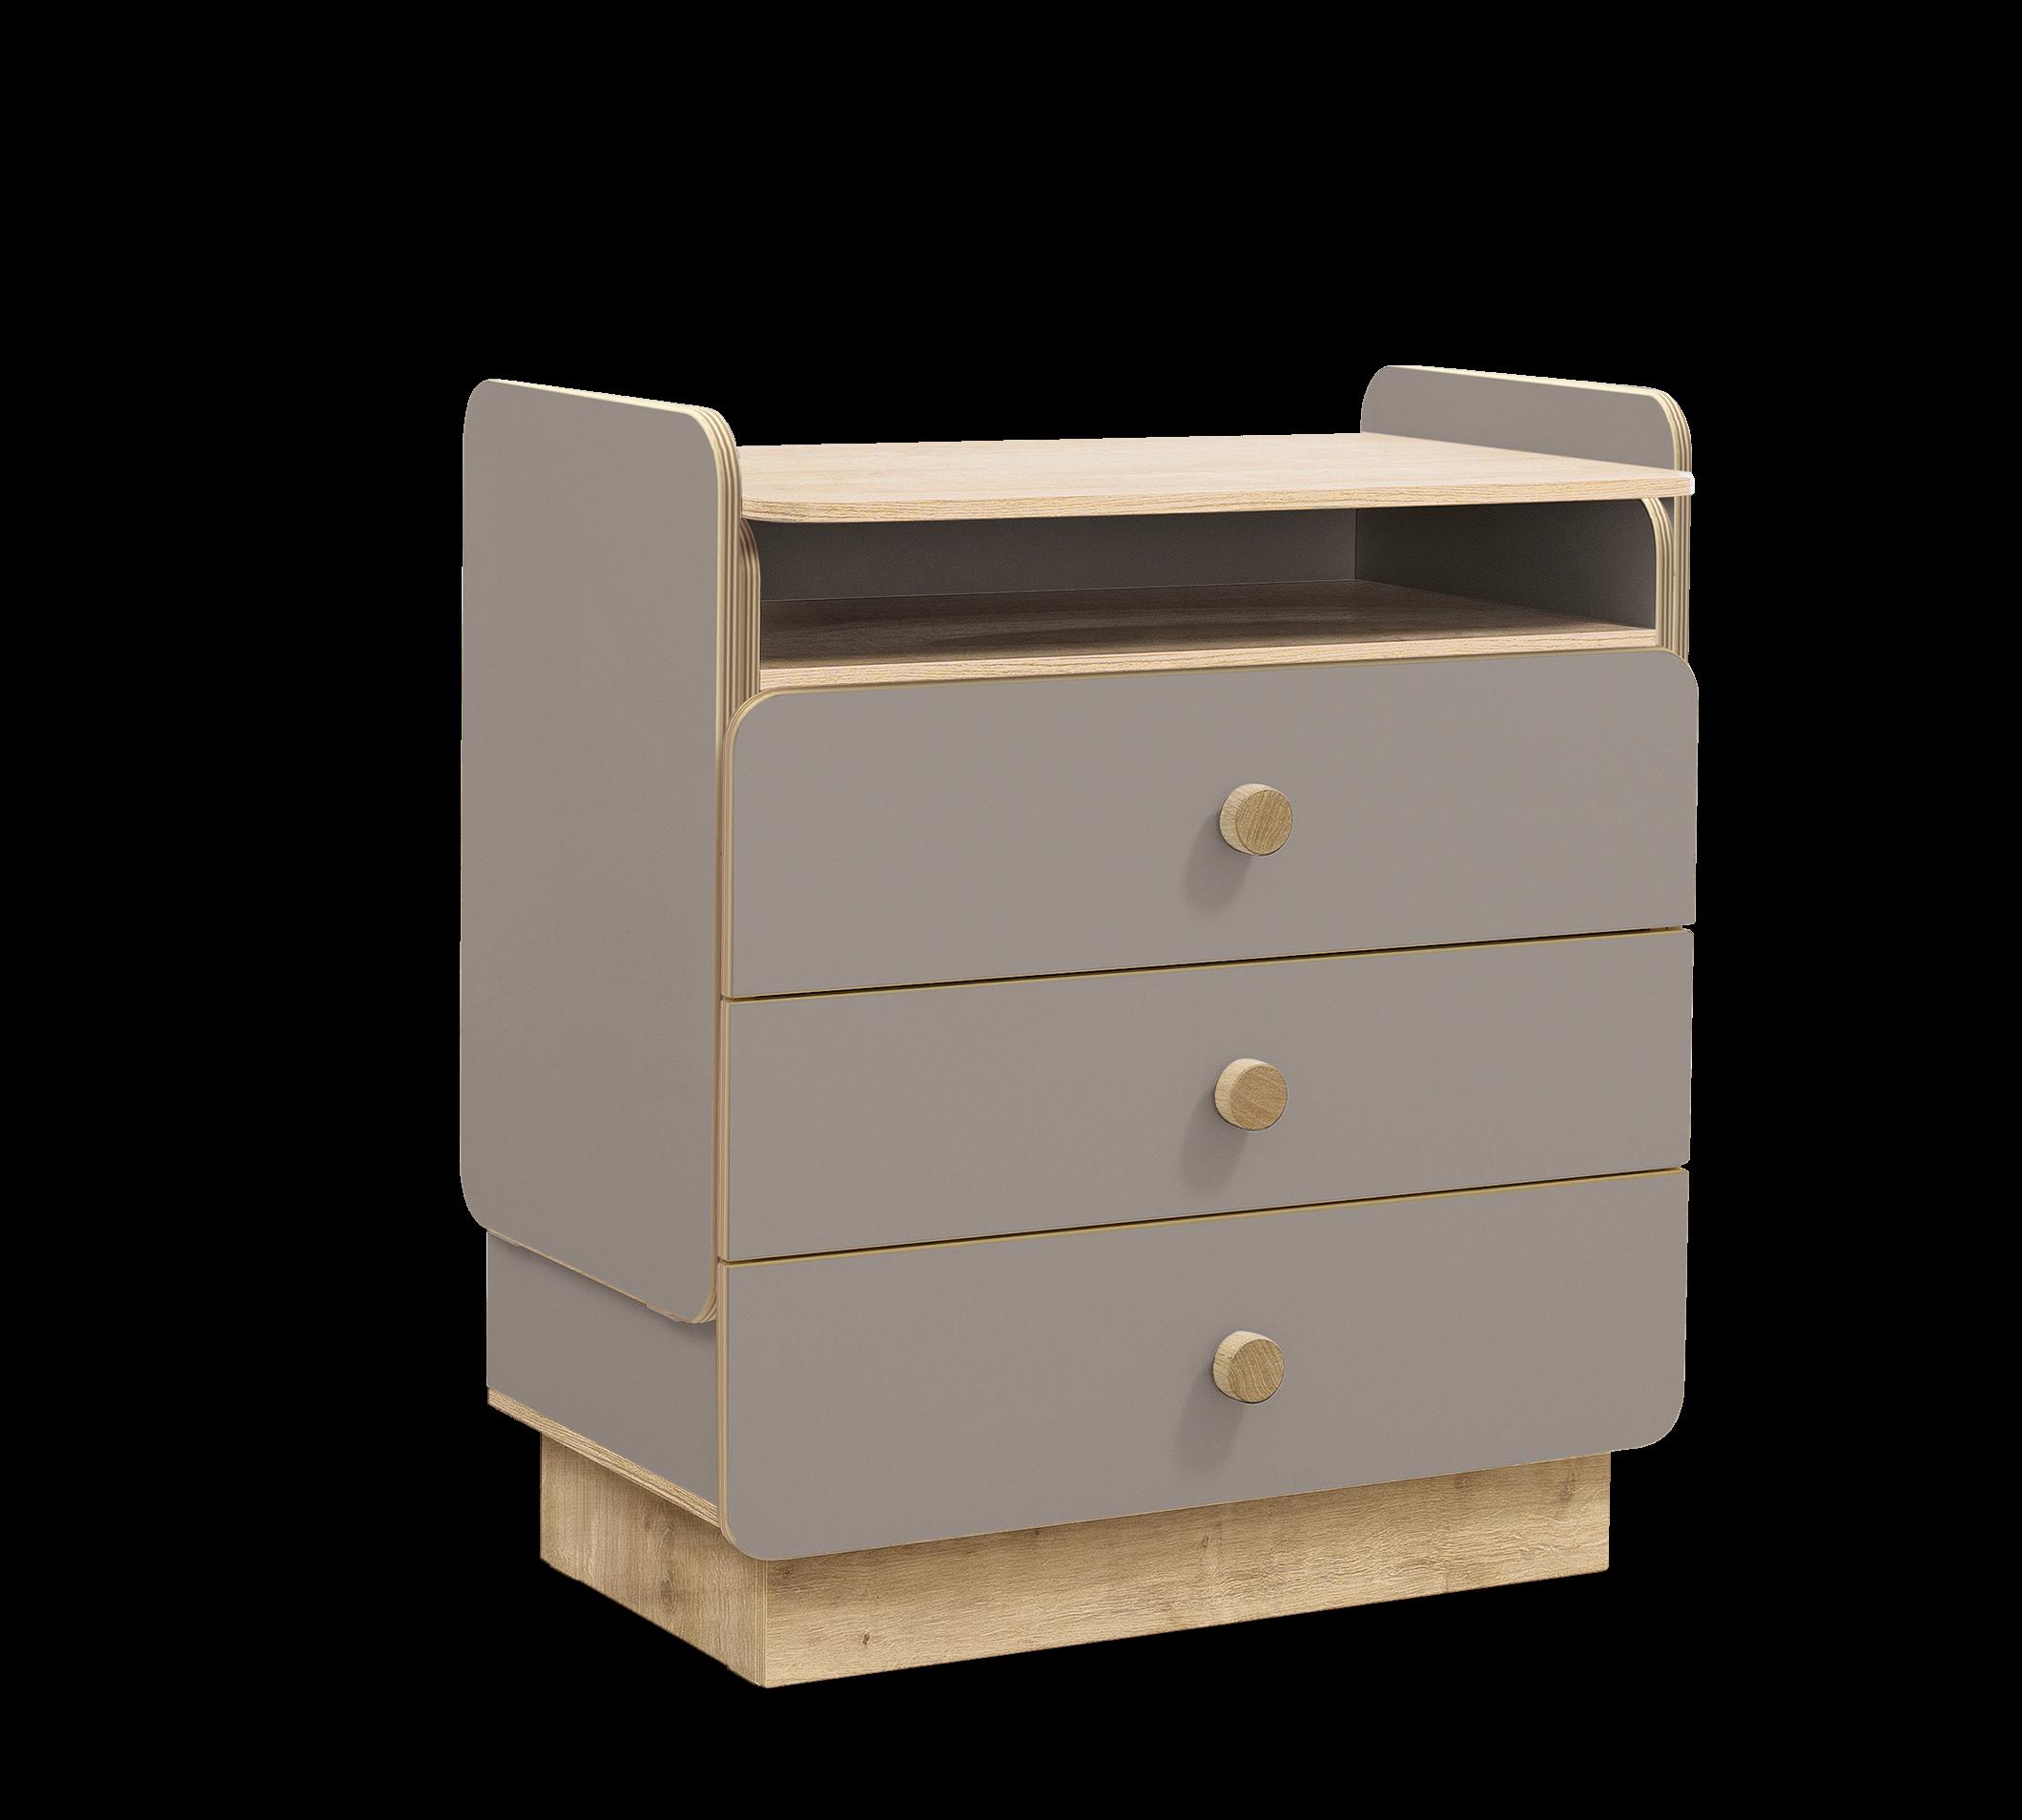 Comoda din pal cu 3 sertare, transformabila pentru bebe Baby Grey / Natural, l85xA51xH94 cm imagine